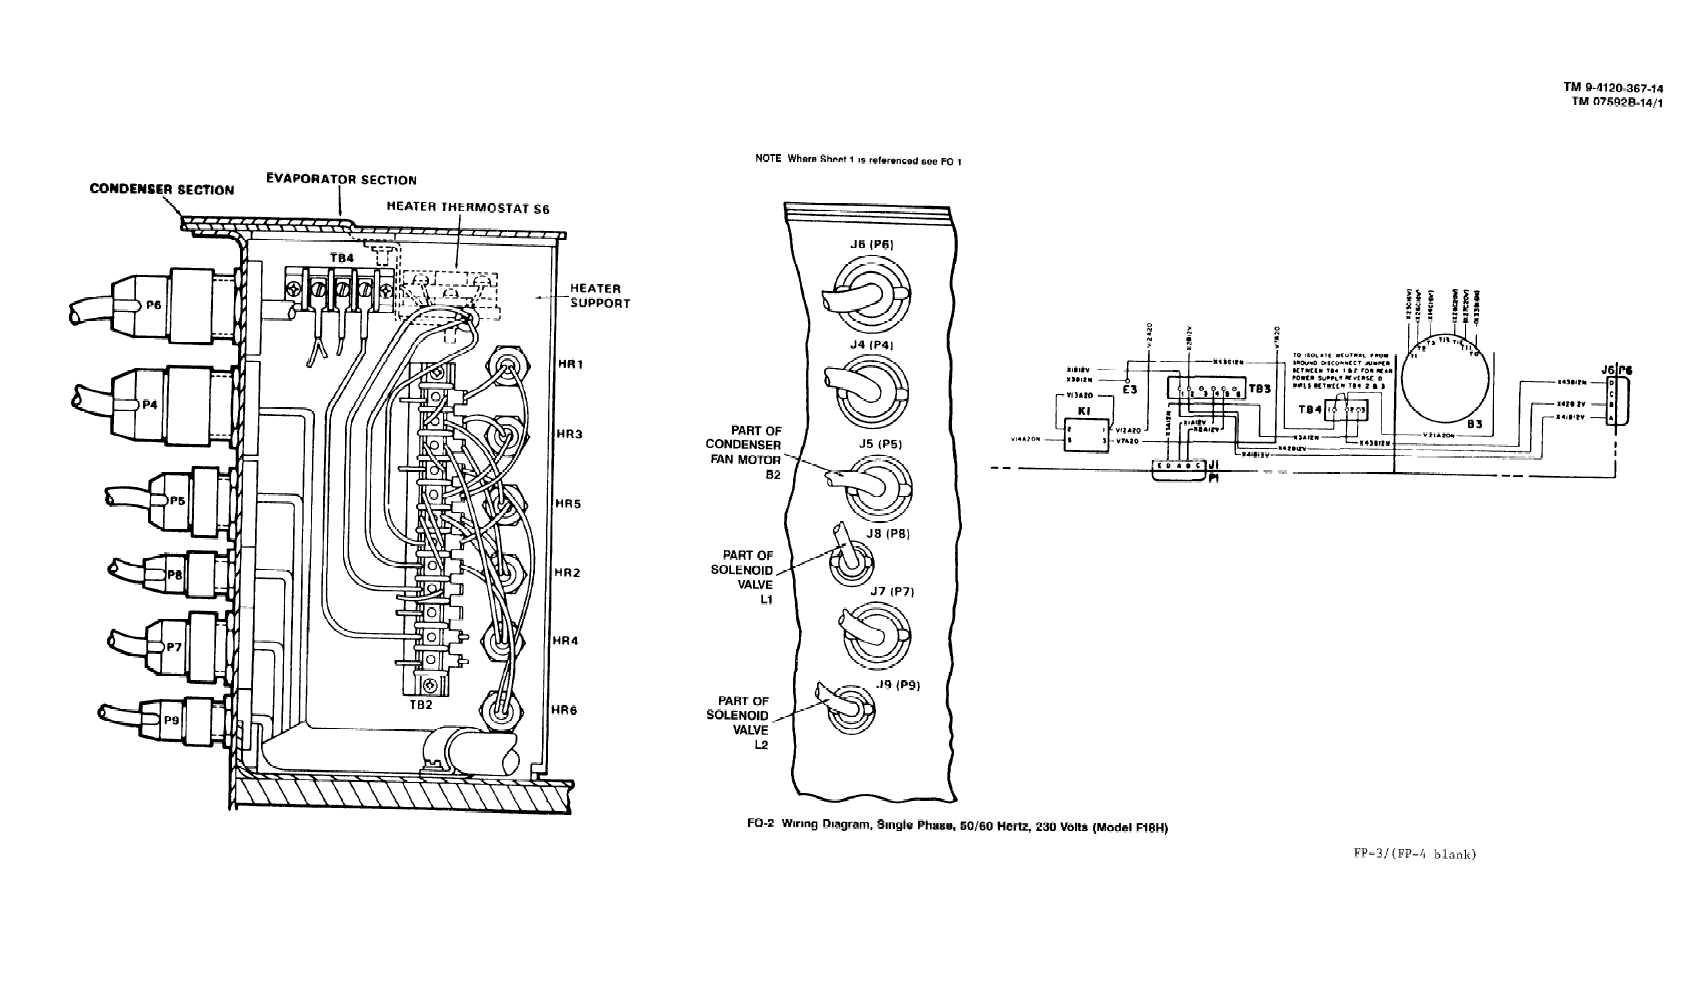 transformer ledningsdiagram